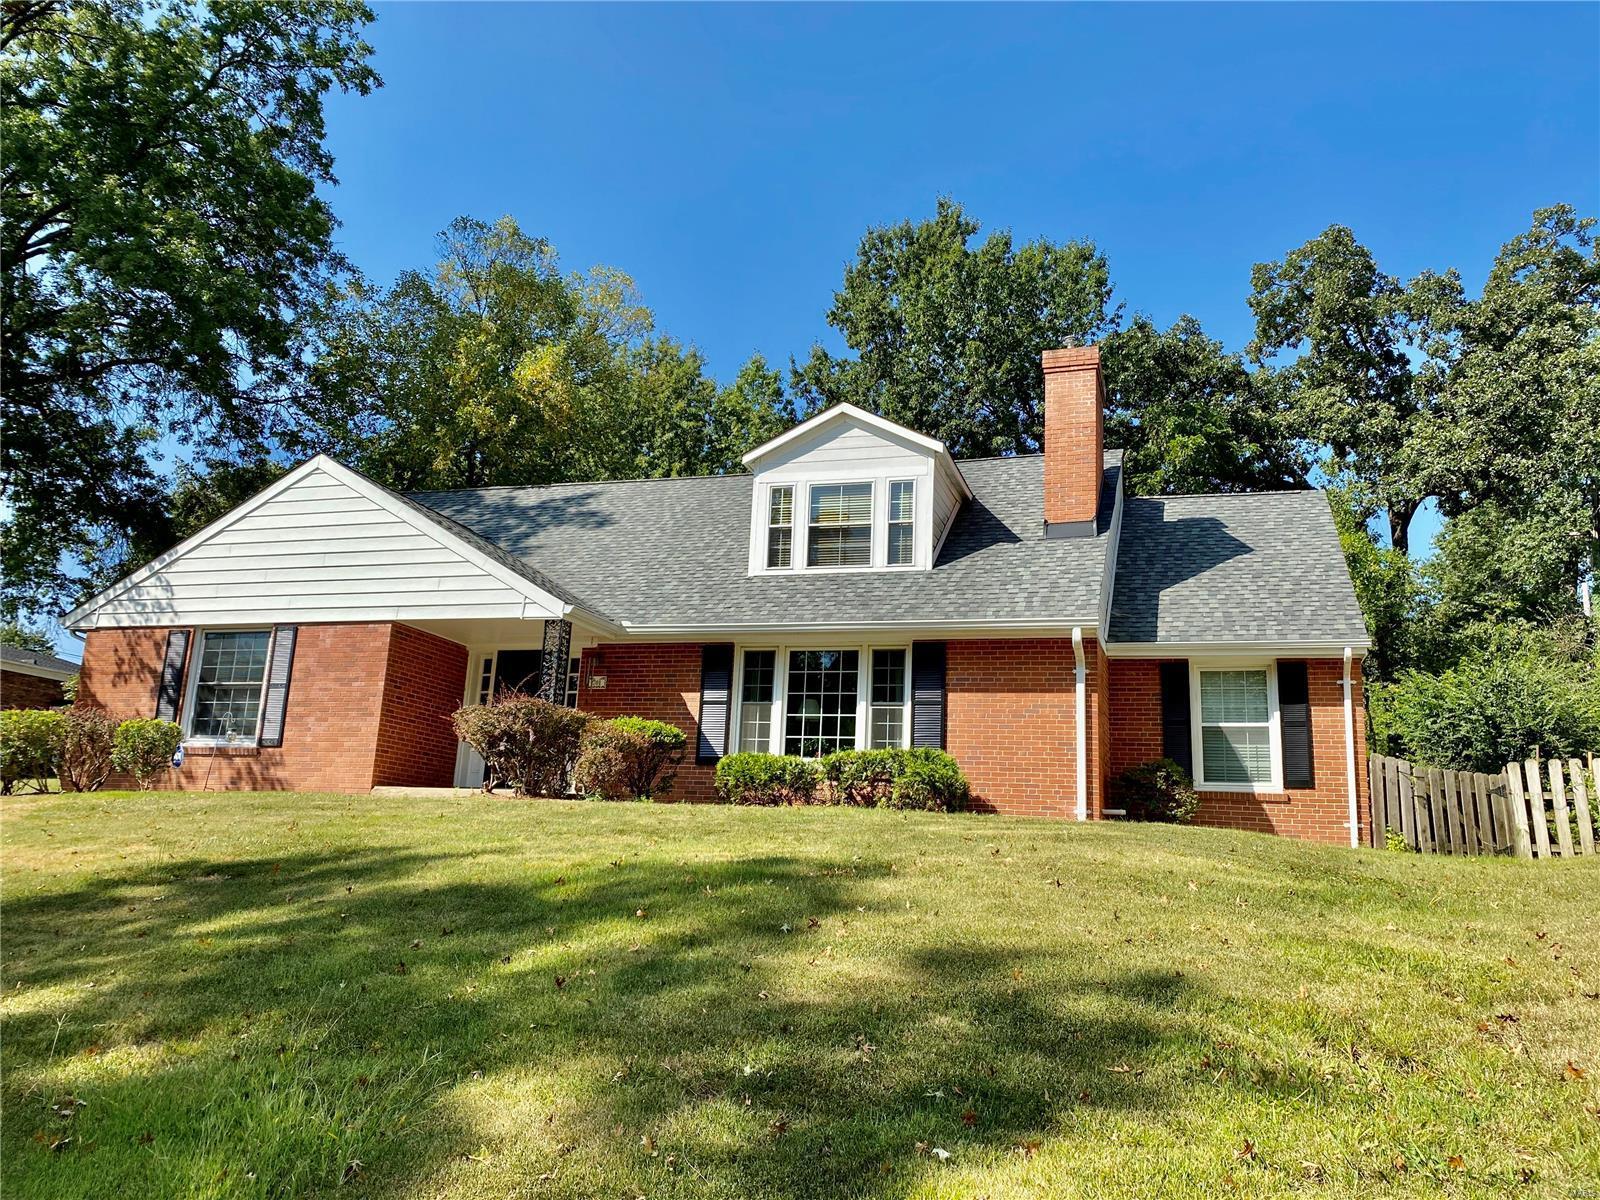 701 Oakbrook Property Photo - University City, MO real estate listing